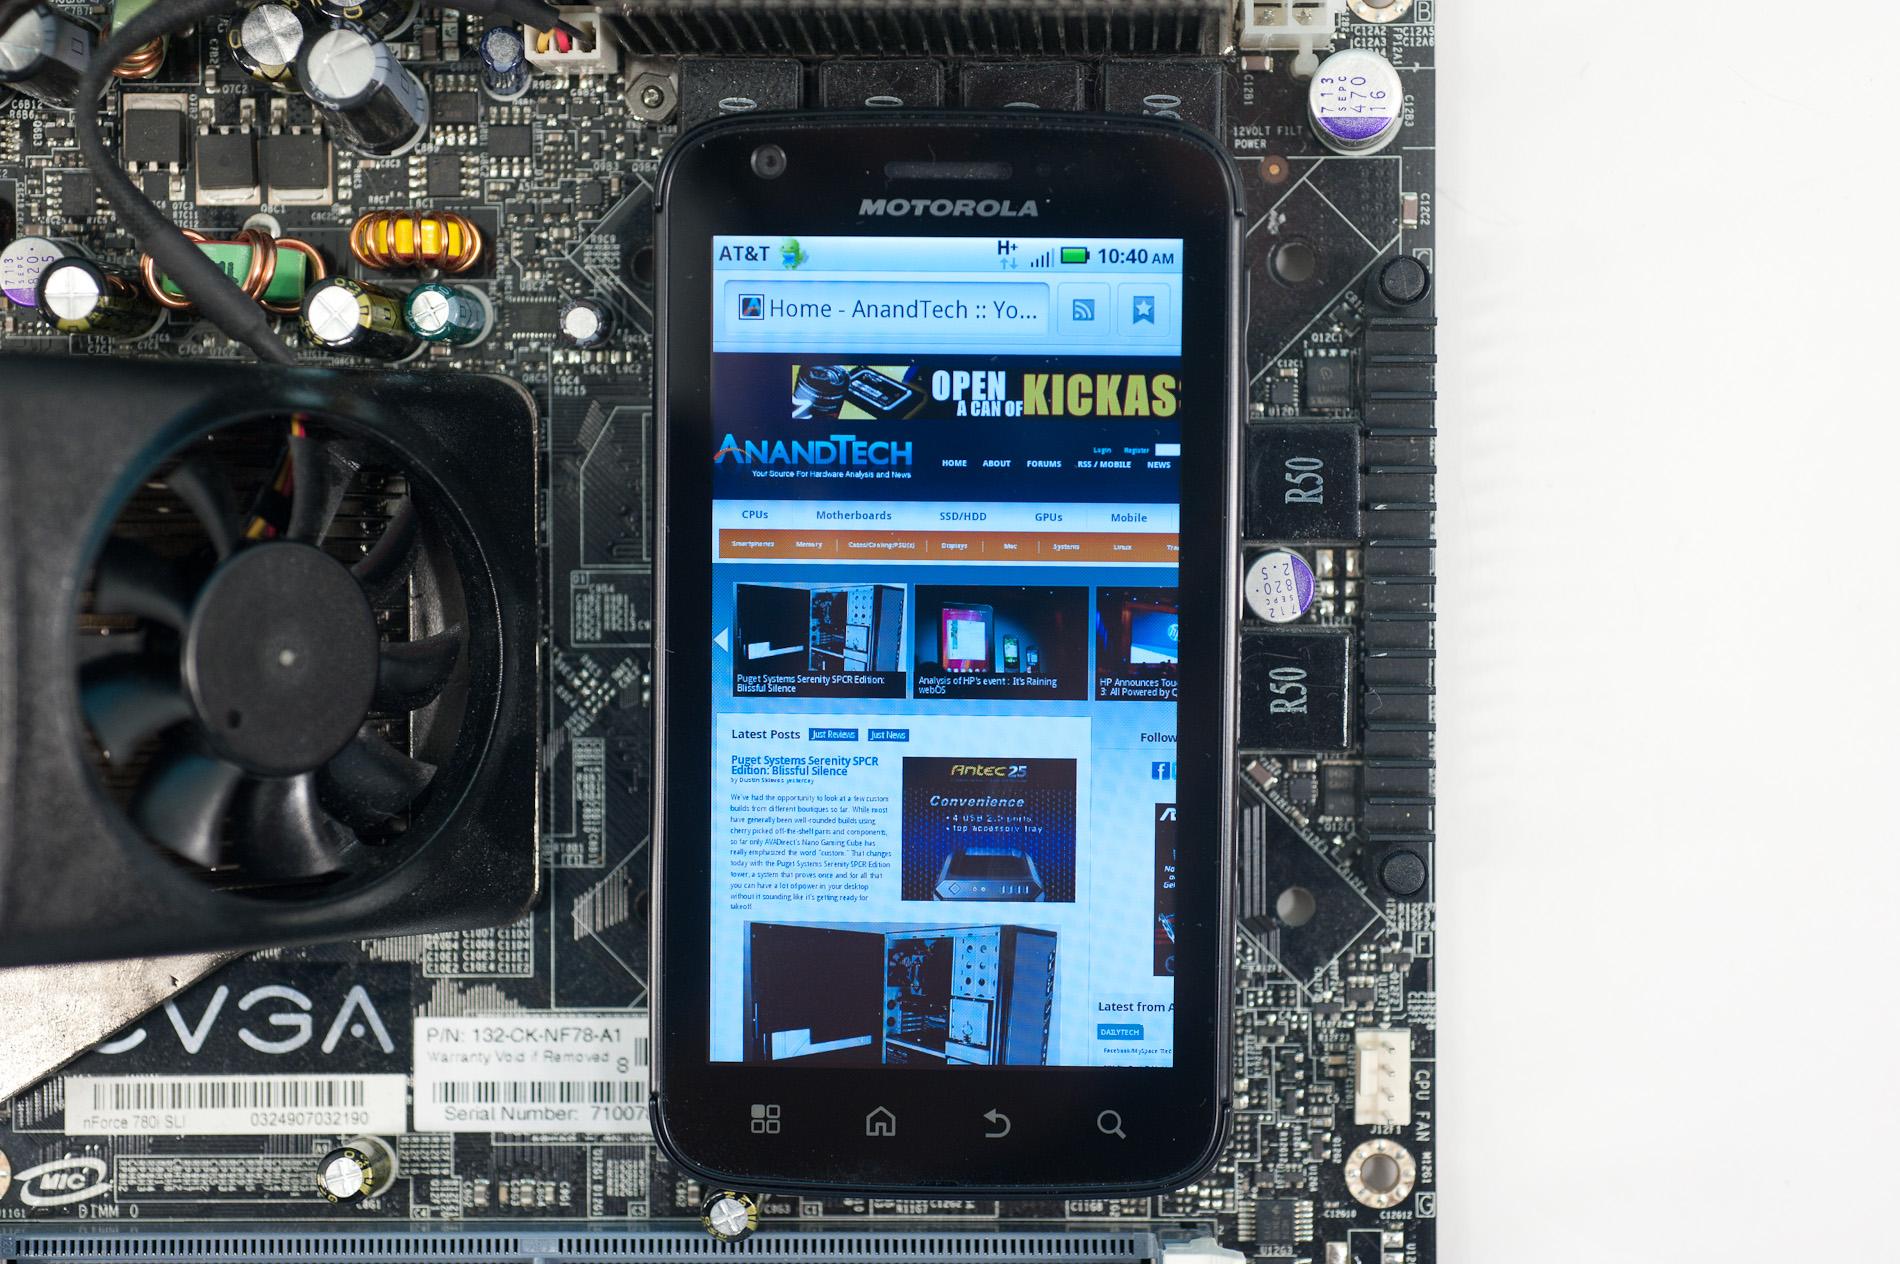 The qHD Screen: A PenTile LCD? - The Motorola Atrix 4G Preview